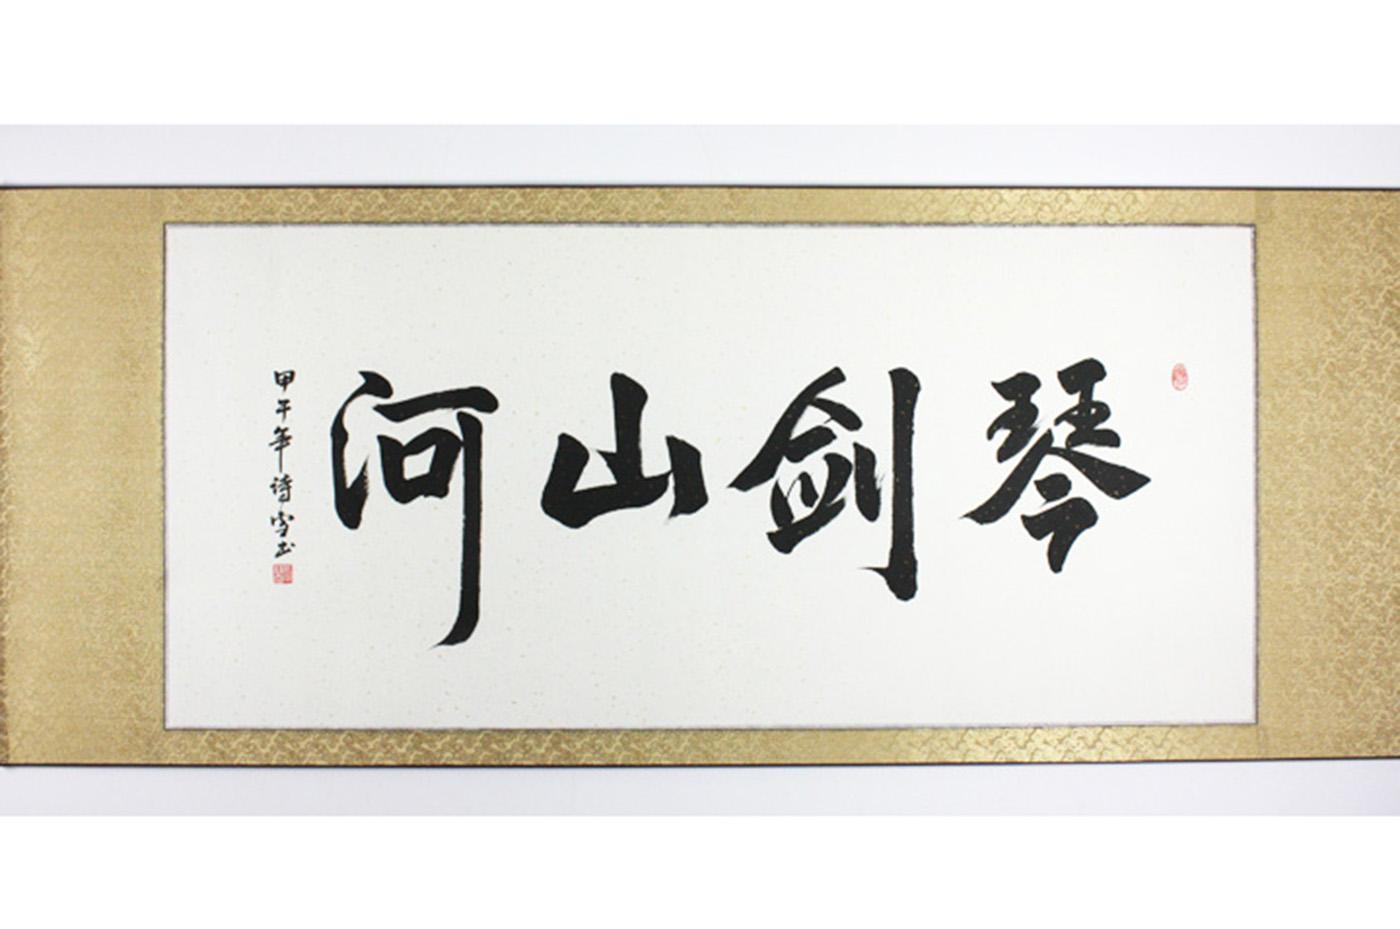 Calligraphine force et douceur